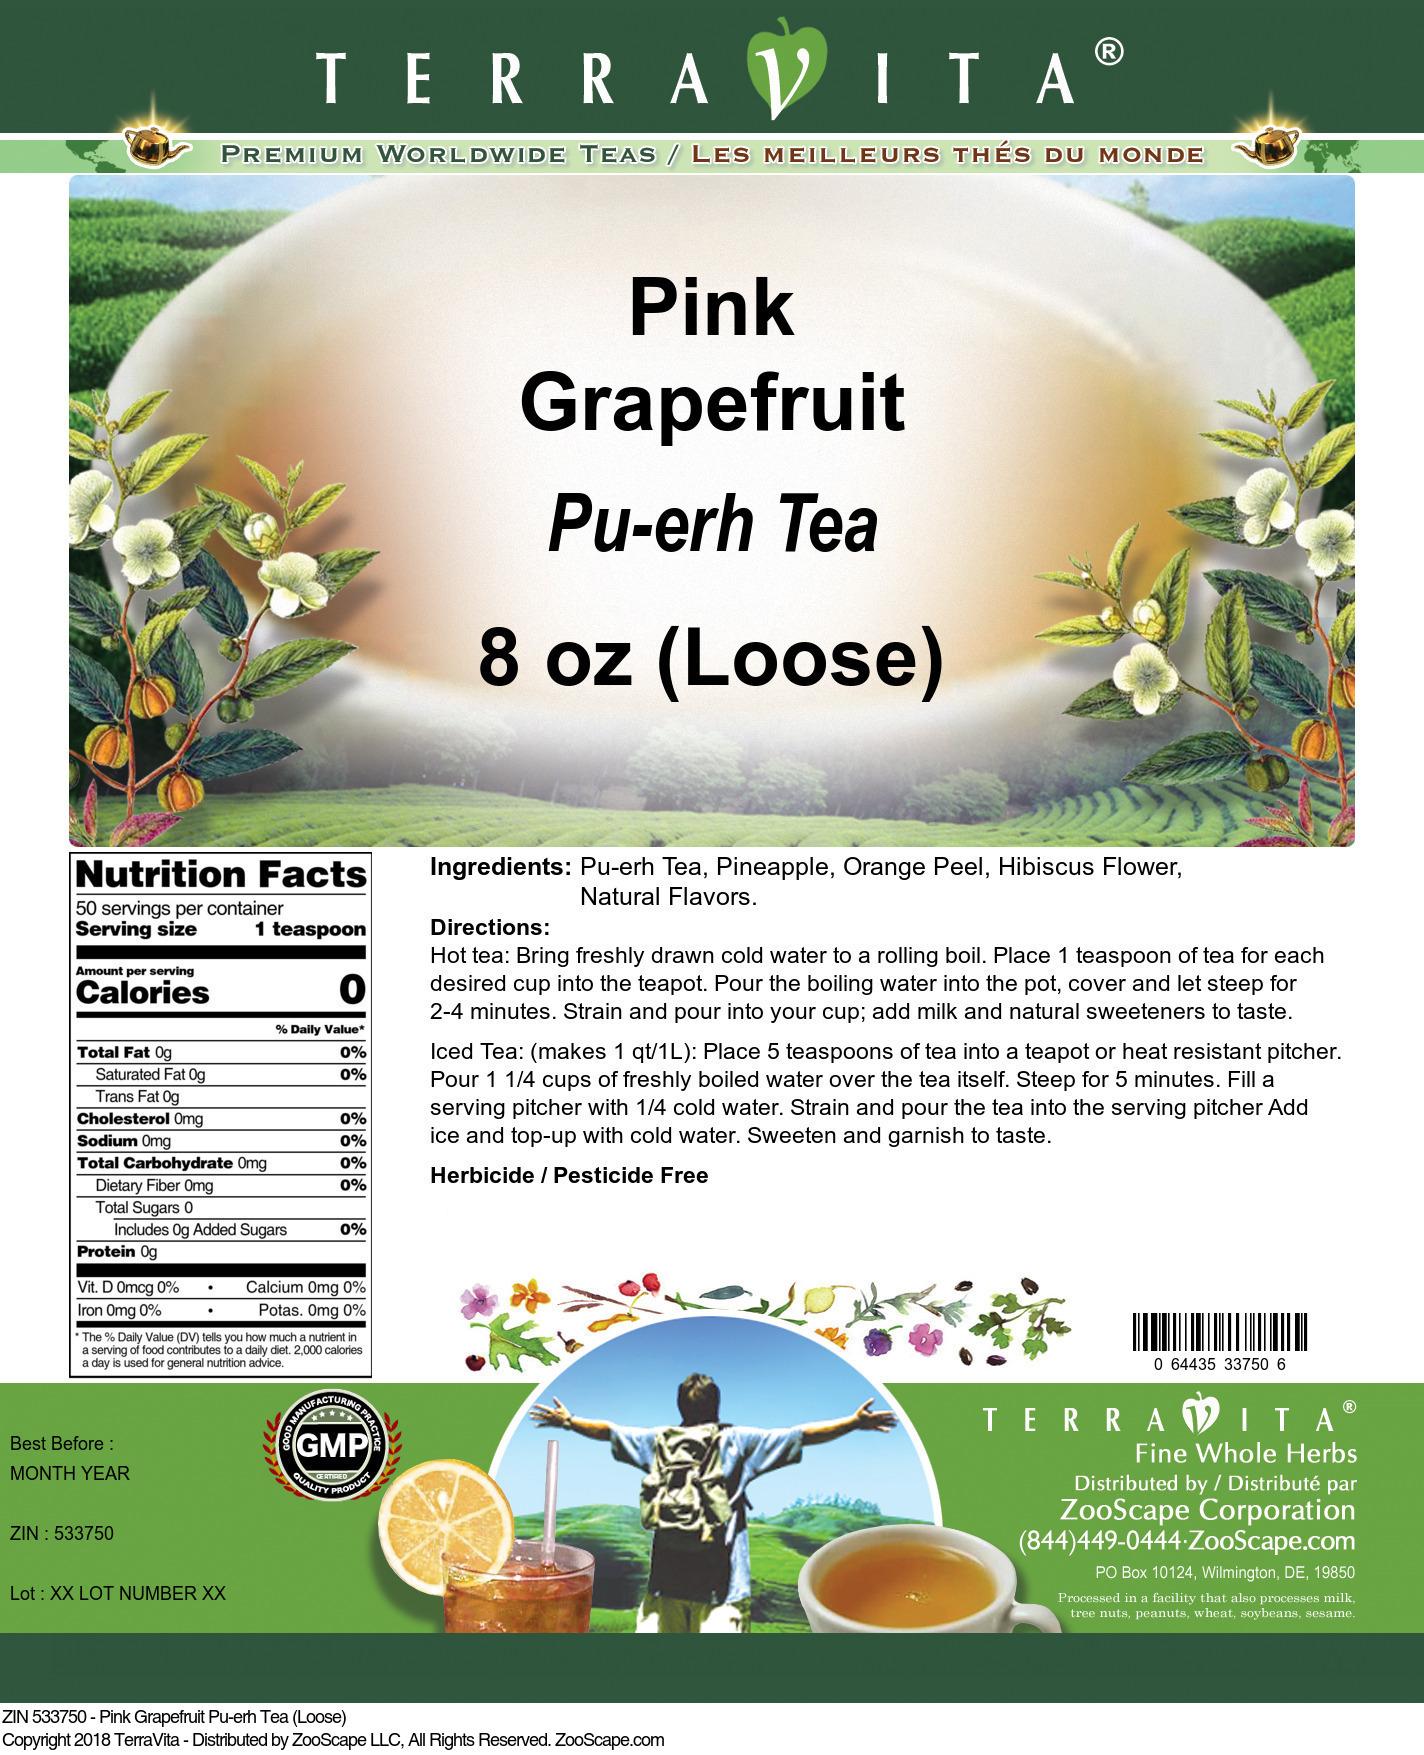 Pink Grapefruit Pu-erh Tea (Loose)